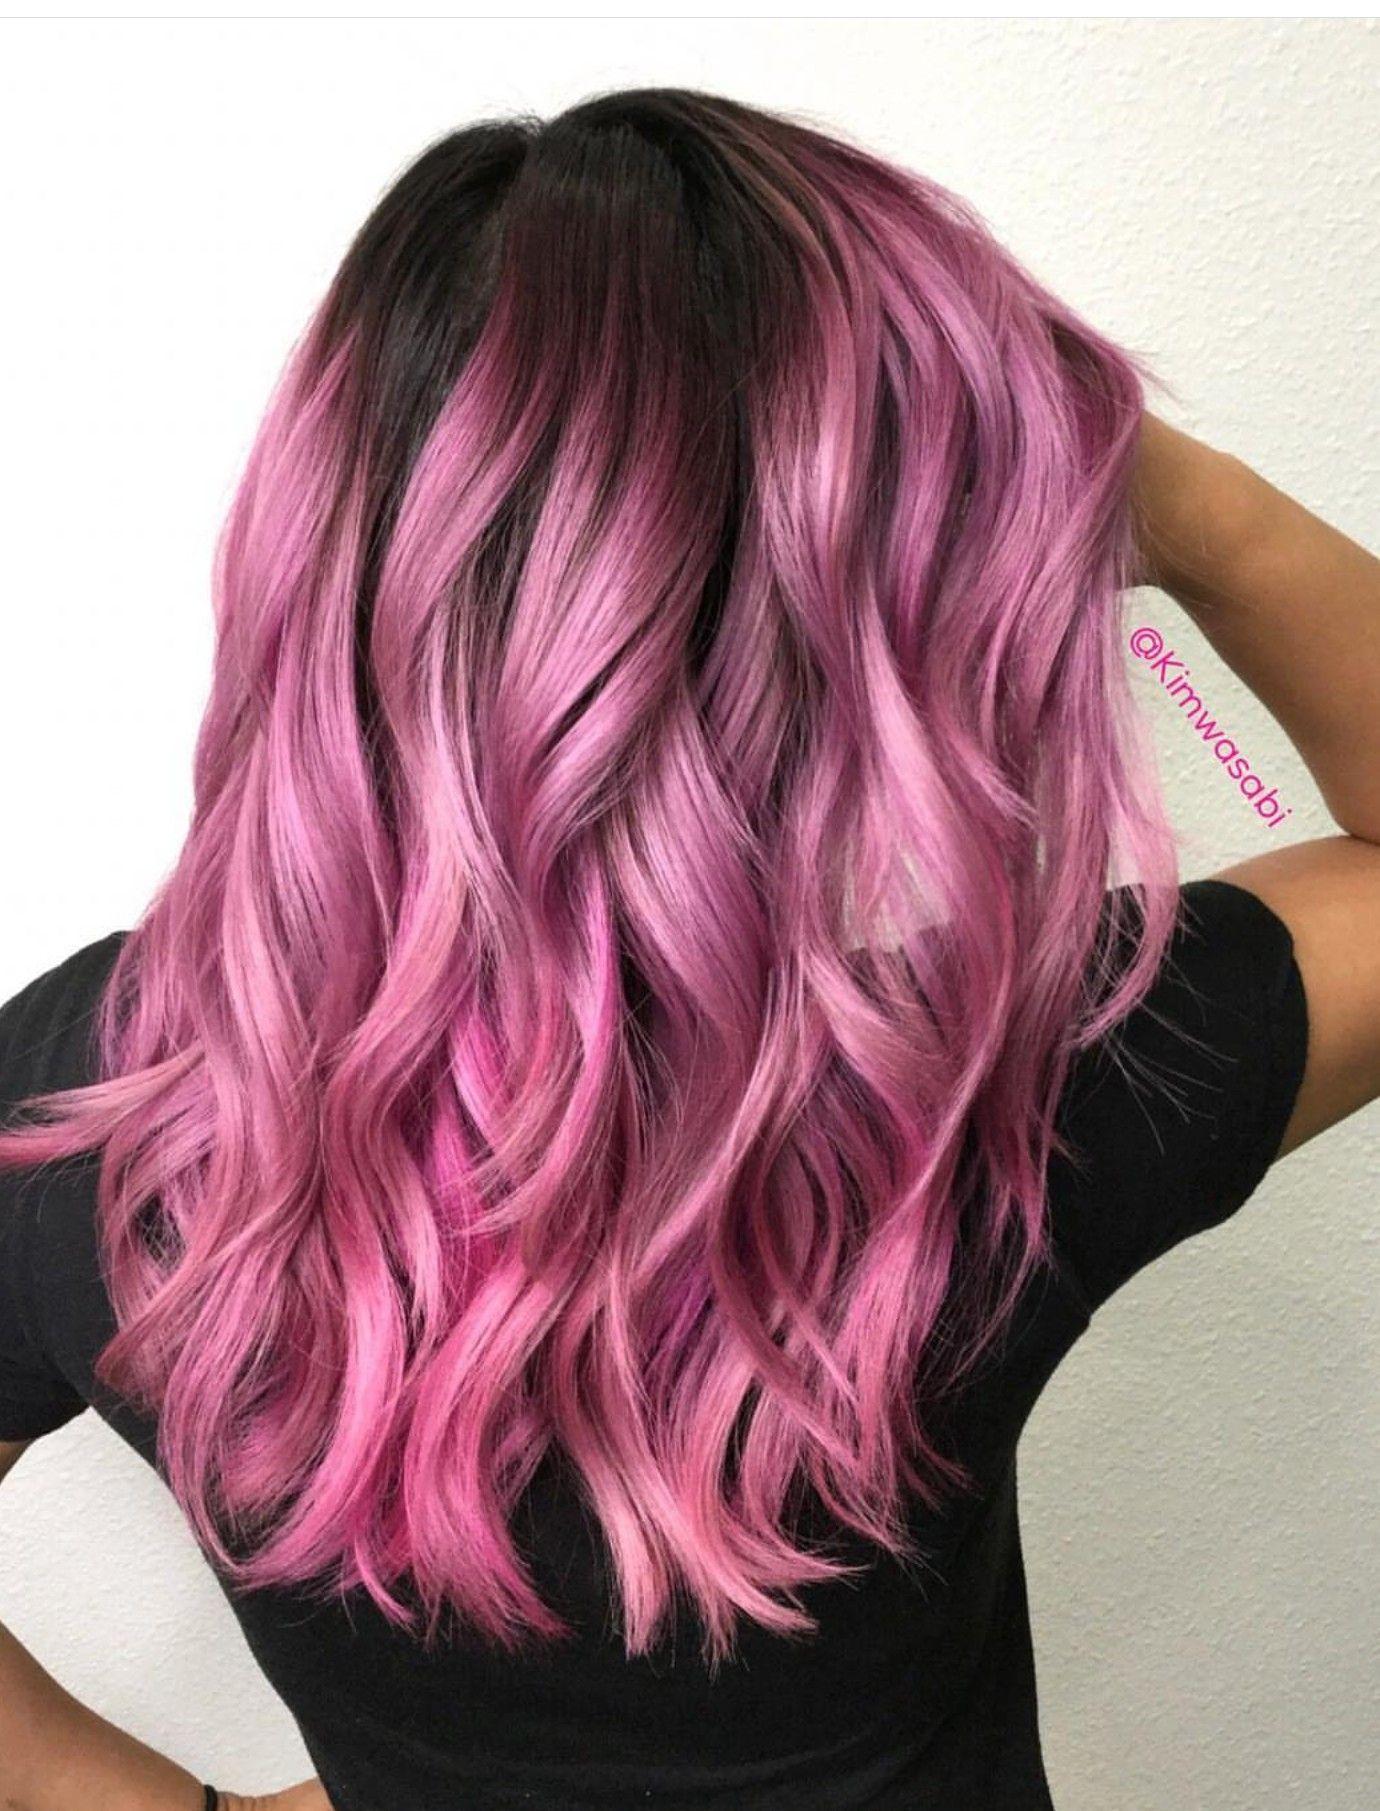 Pinterest Bellabel19 With Images Pink Hair Dye Hair